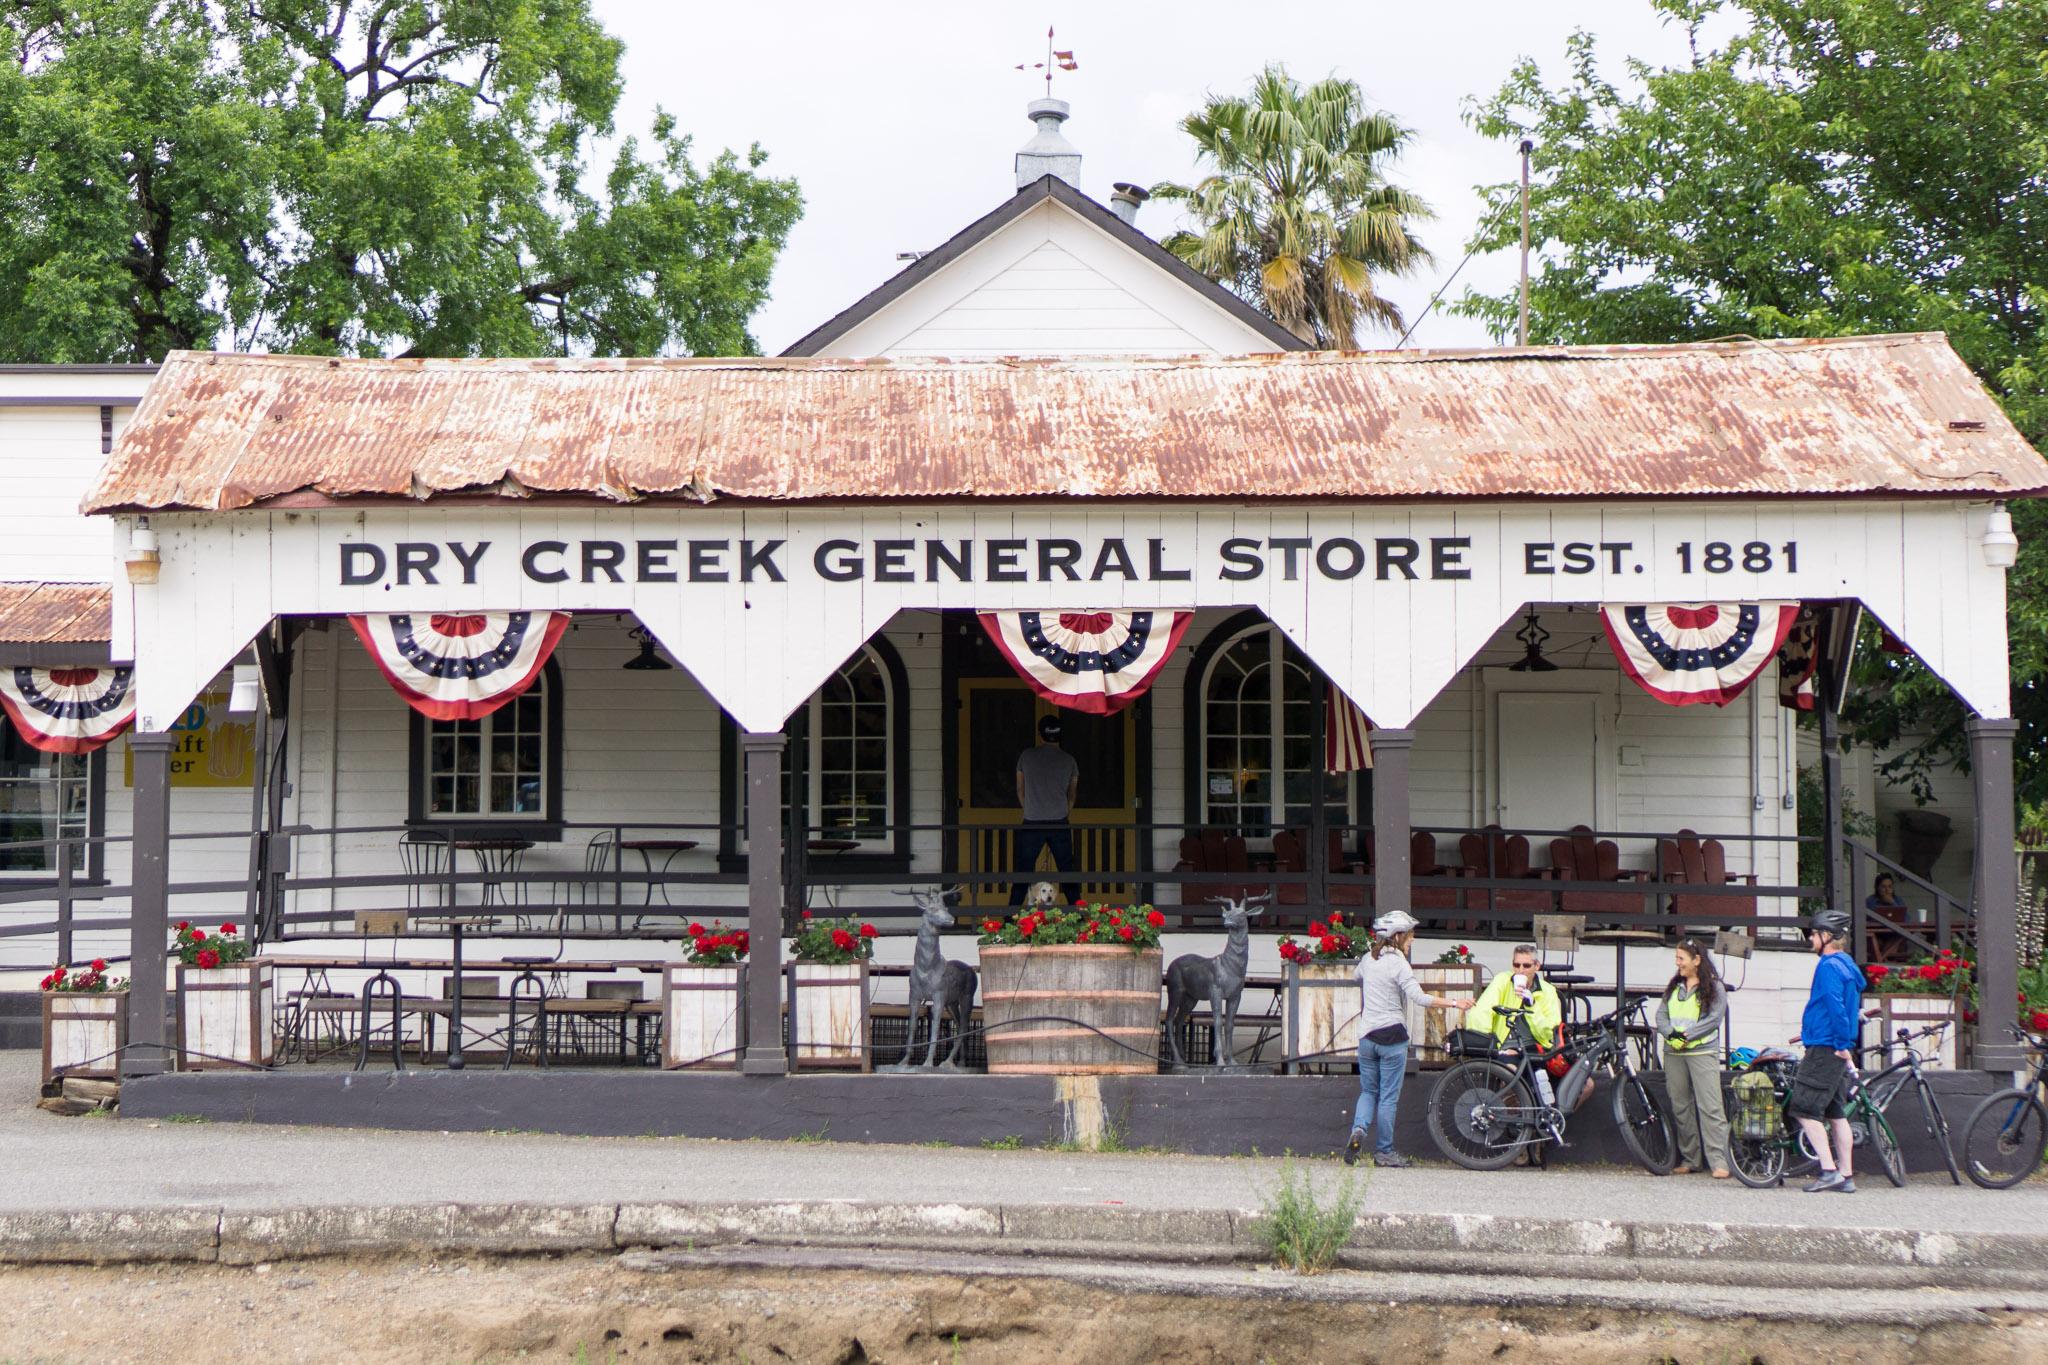 The Dry Creek General Store in Healdsburg.